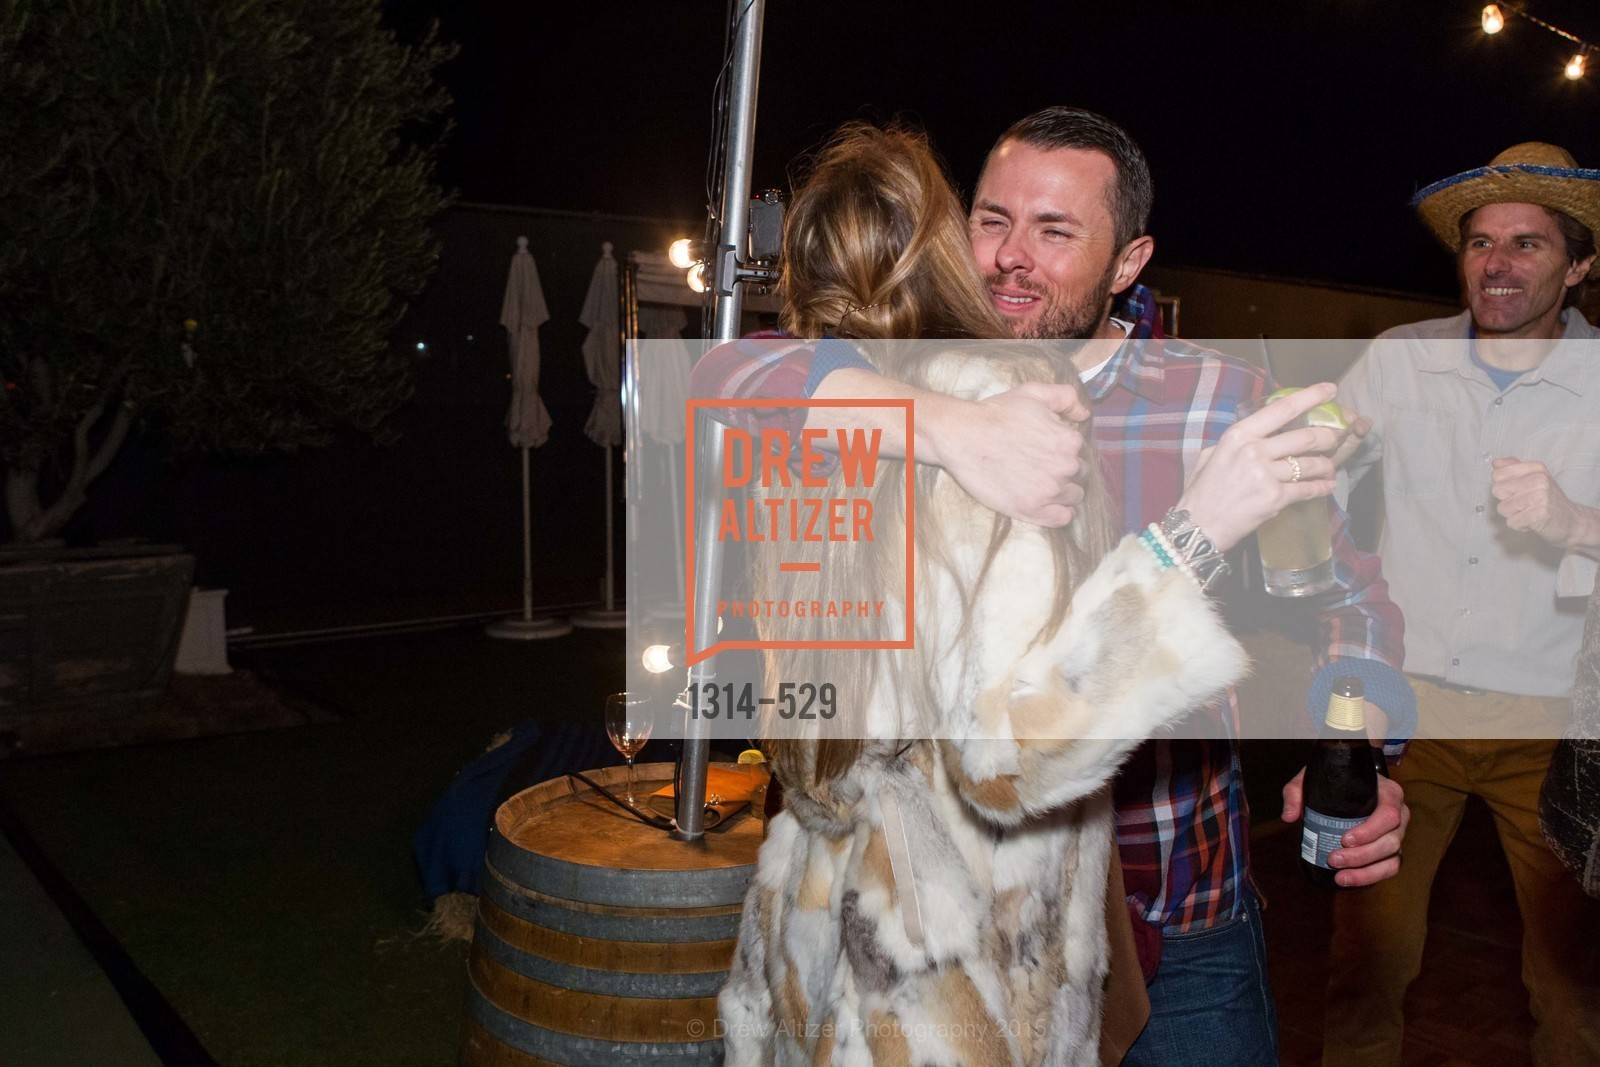 Extras, Hooman's Birthday Celebration At Bay Club Ross Valley, November 14th, 2015, Photo